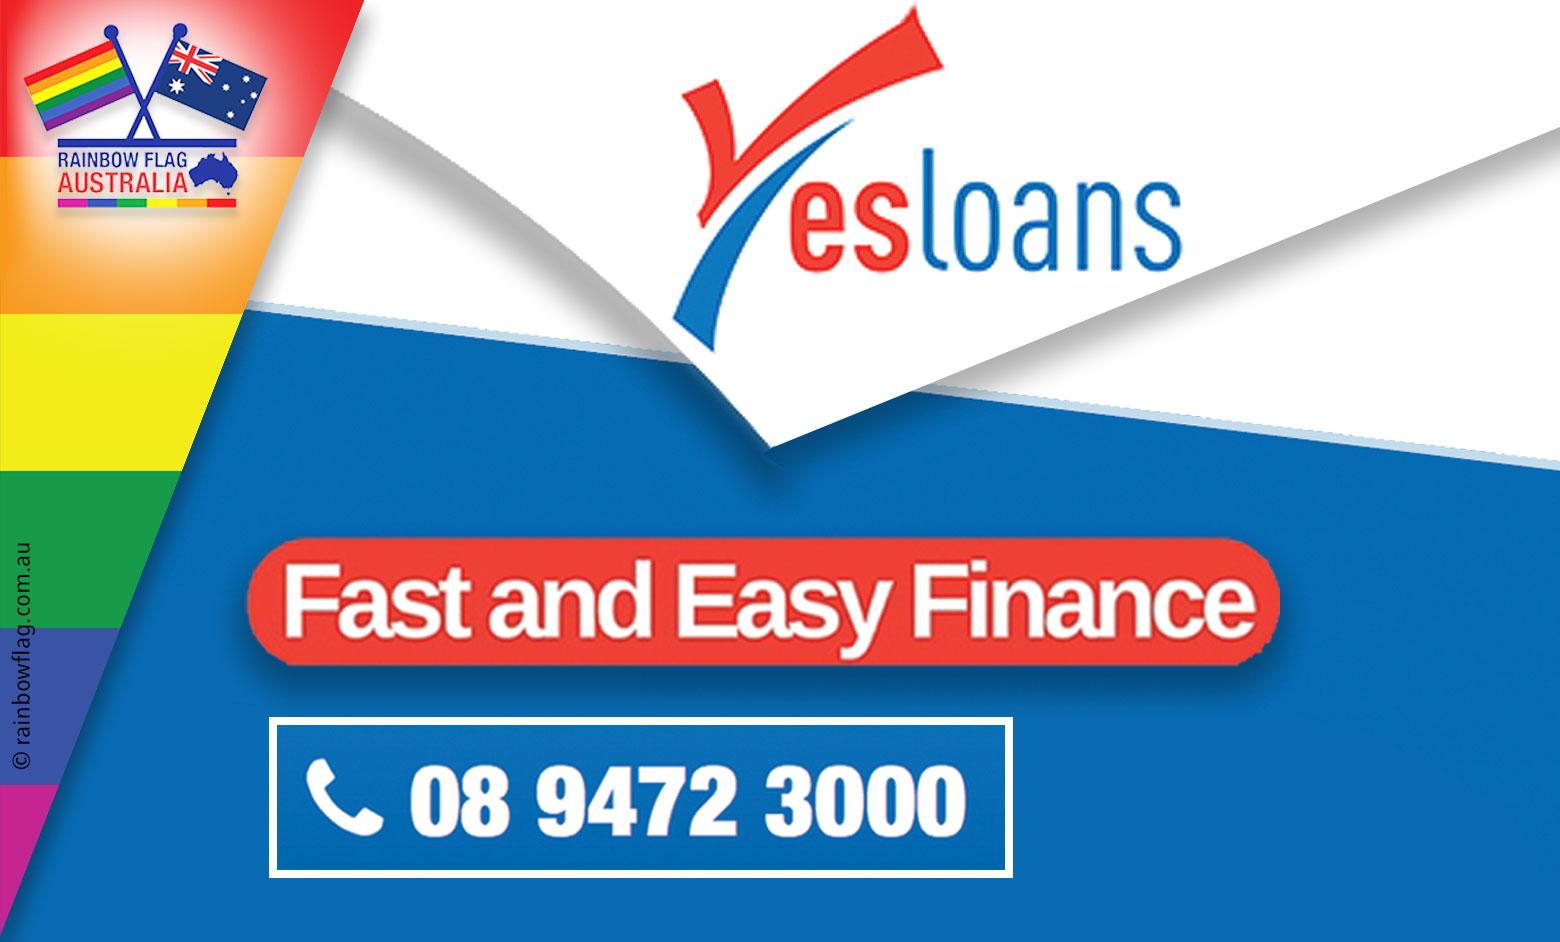 Yes Loans